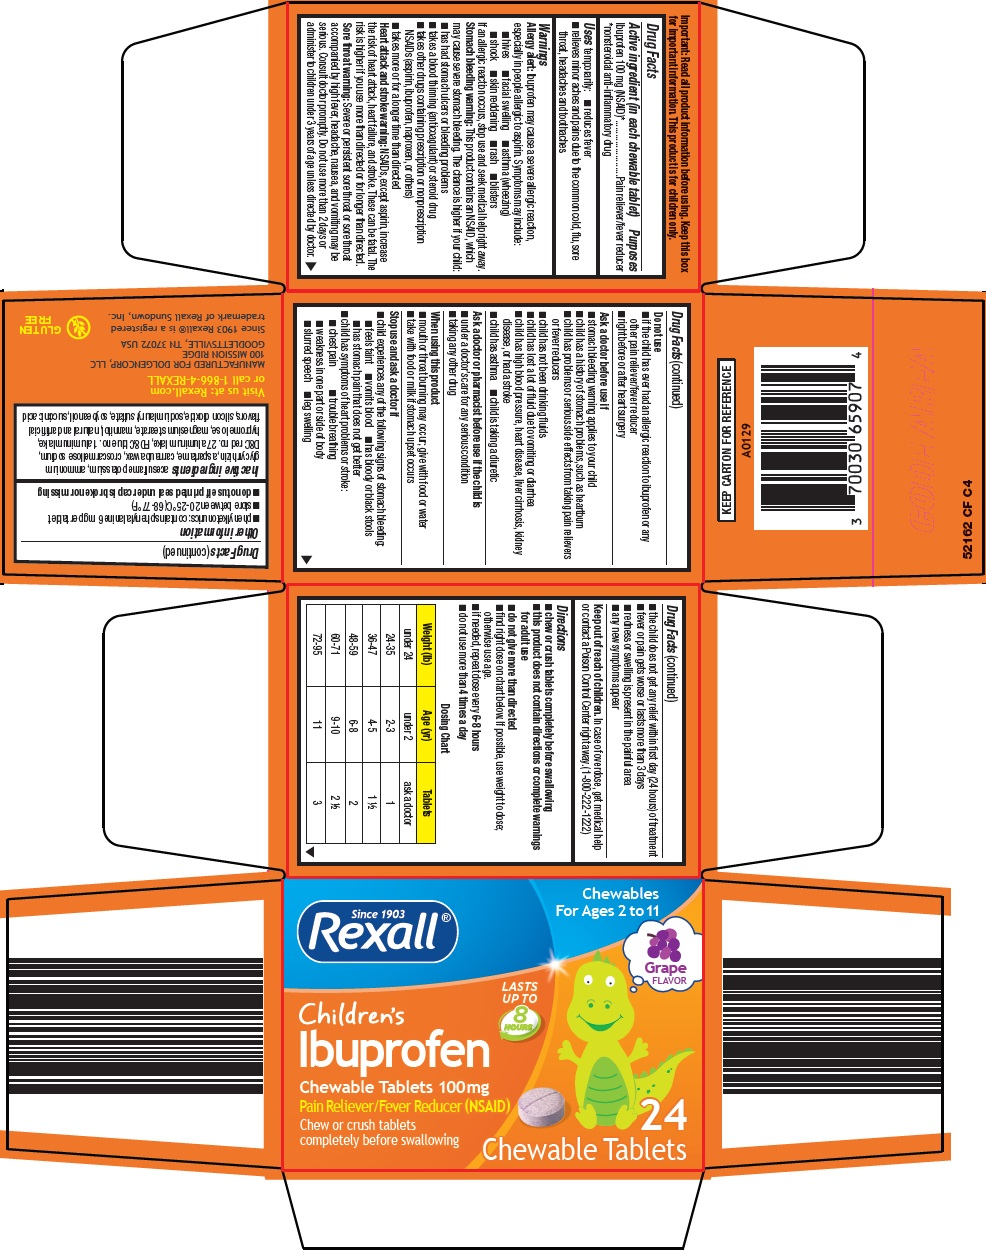 521-cf-childrens-ibuprofen.jpg